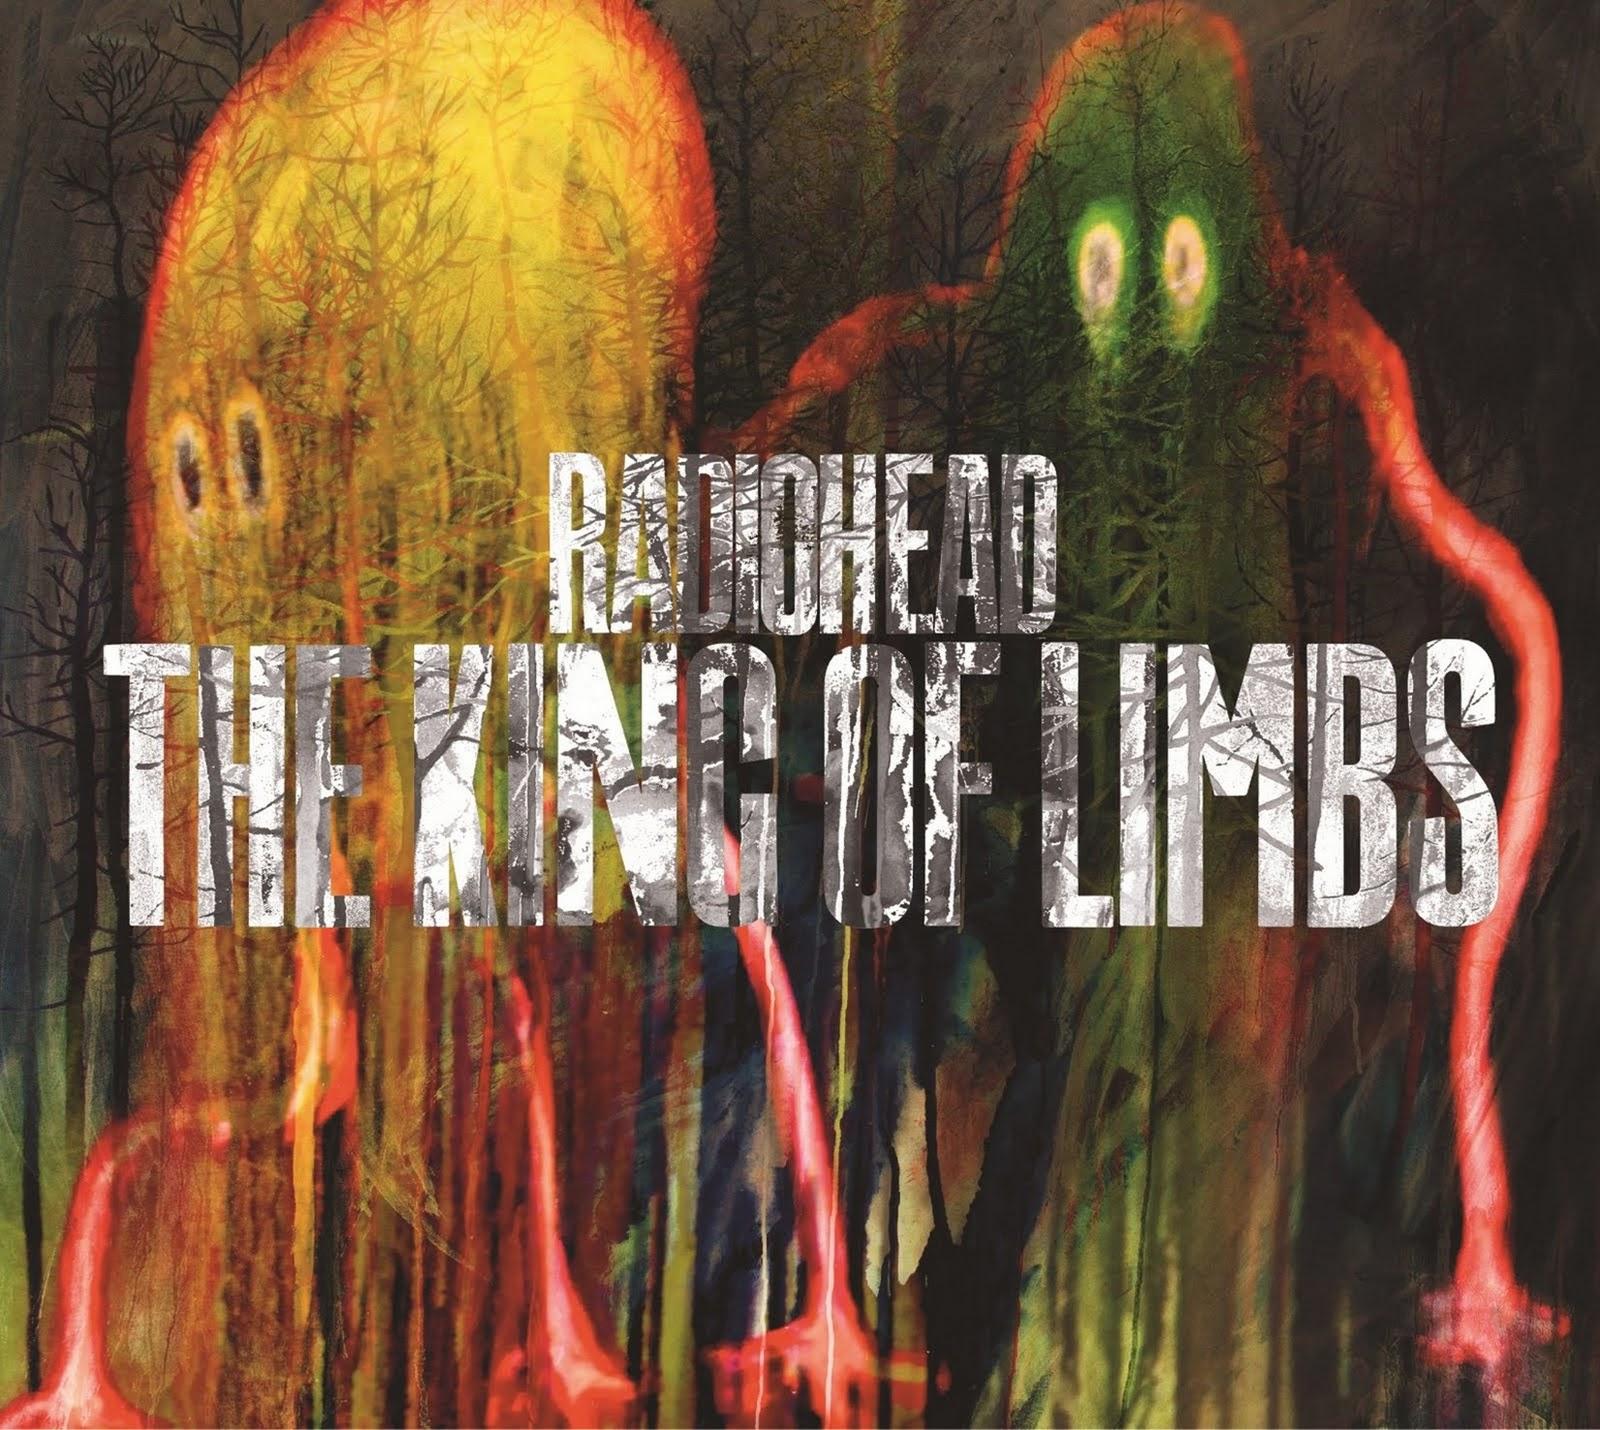 http://1.bp.blogspot.com/-MKBa71_i5SI/TWJTHmXpreI/AAAAAAAAFRQ/uizvvleFDBQ/s1600/the+kings+of+limbs.jpg